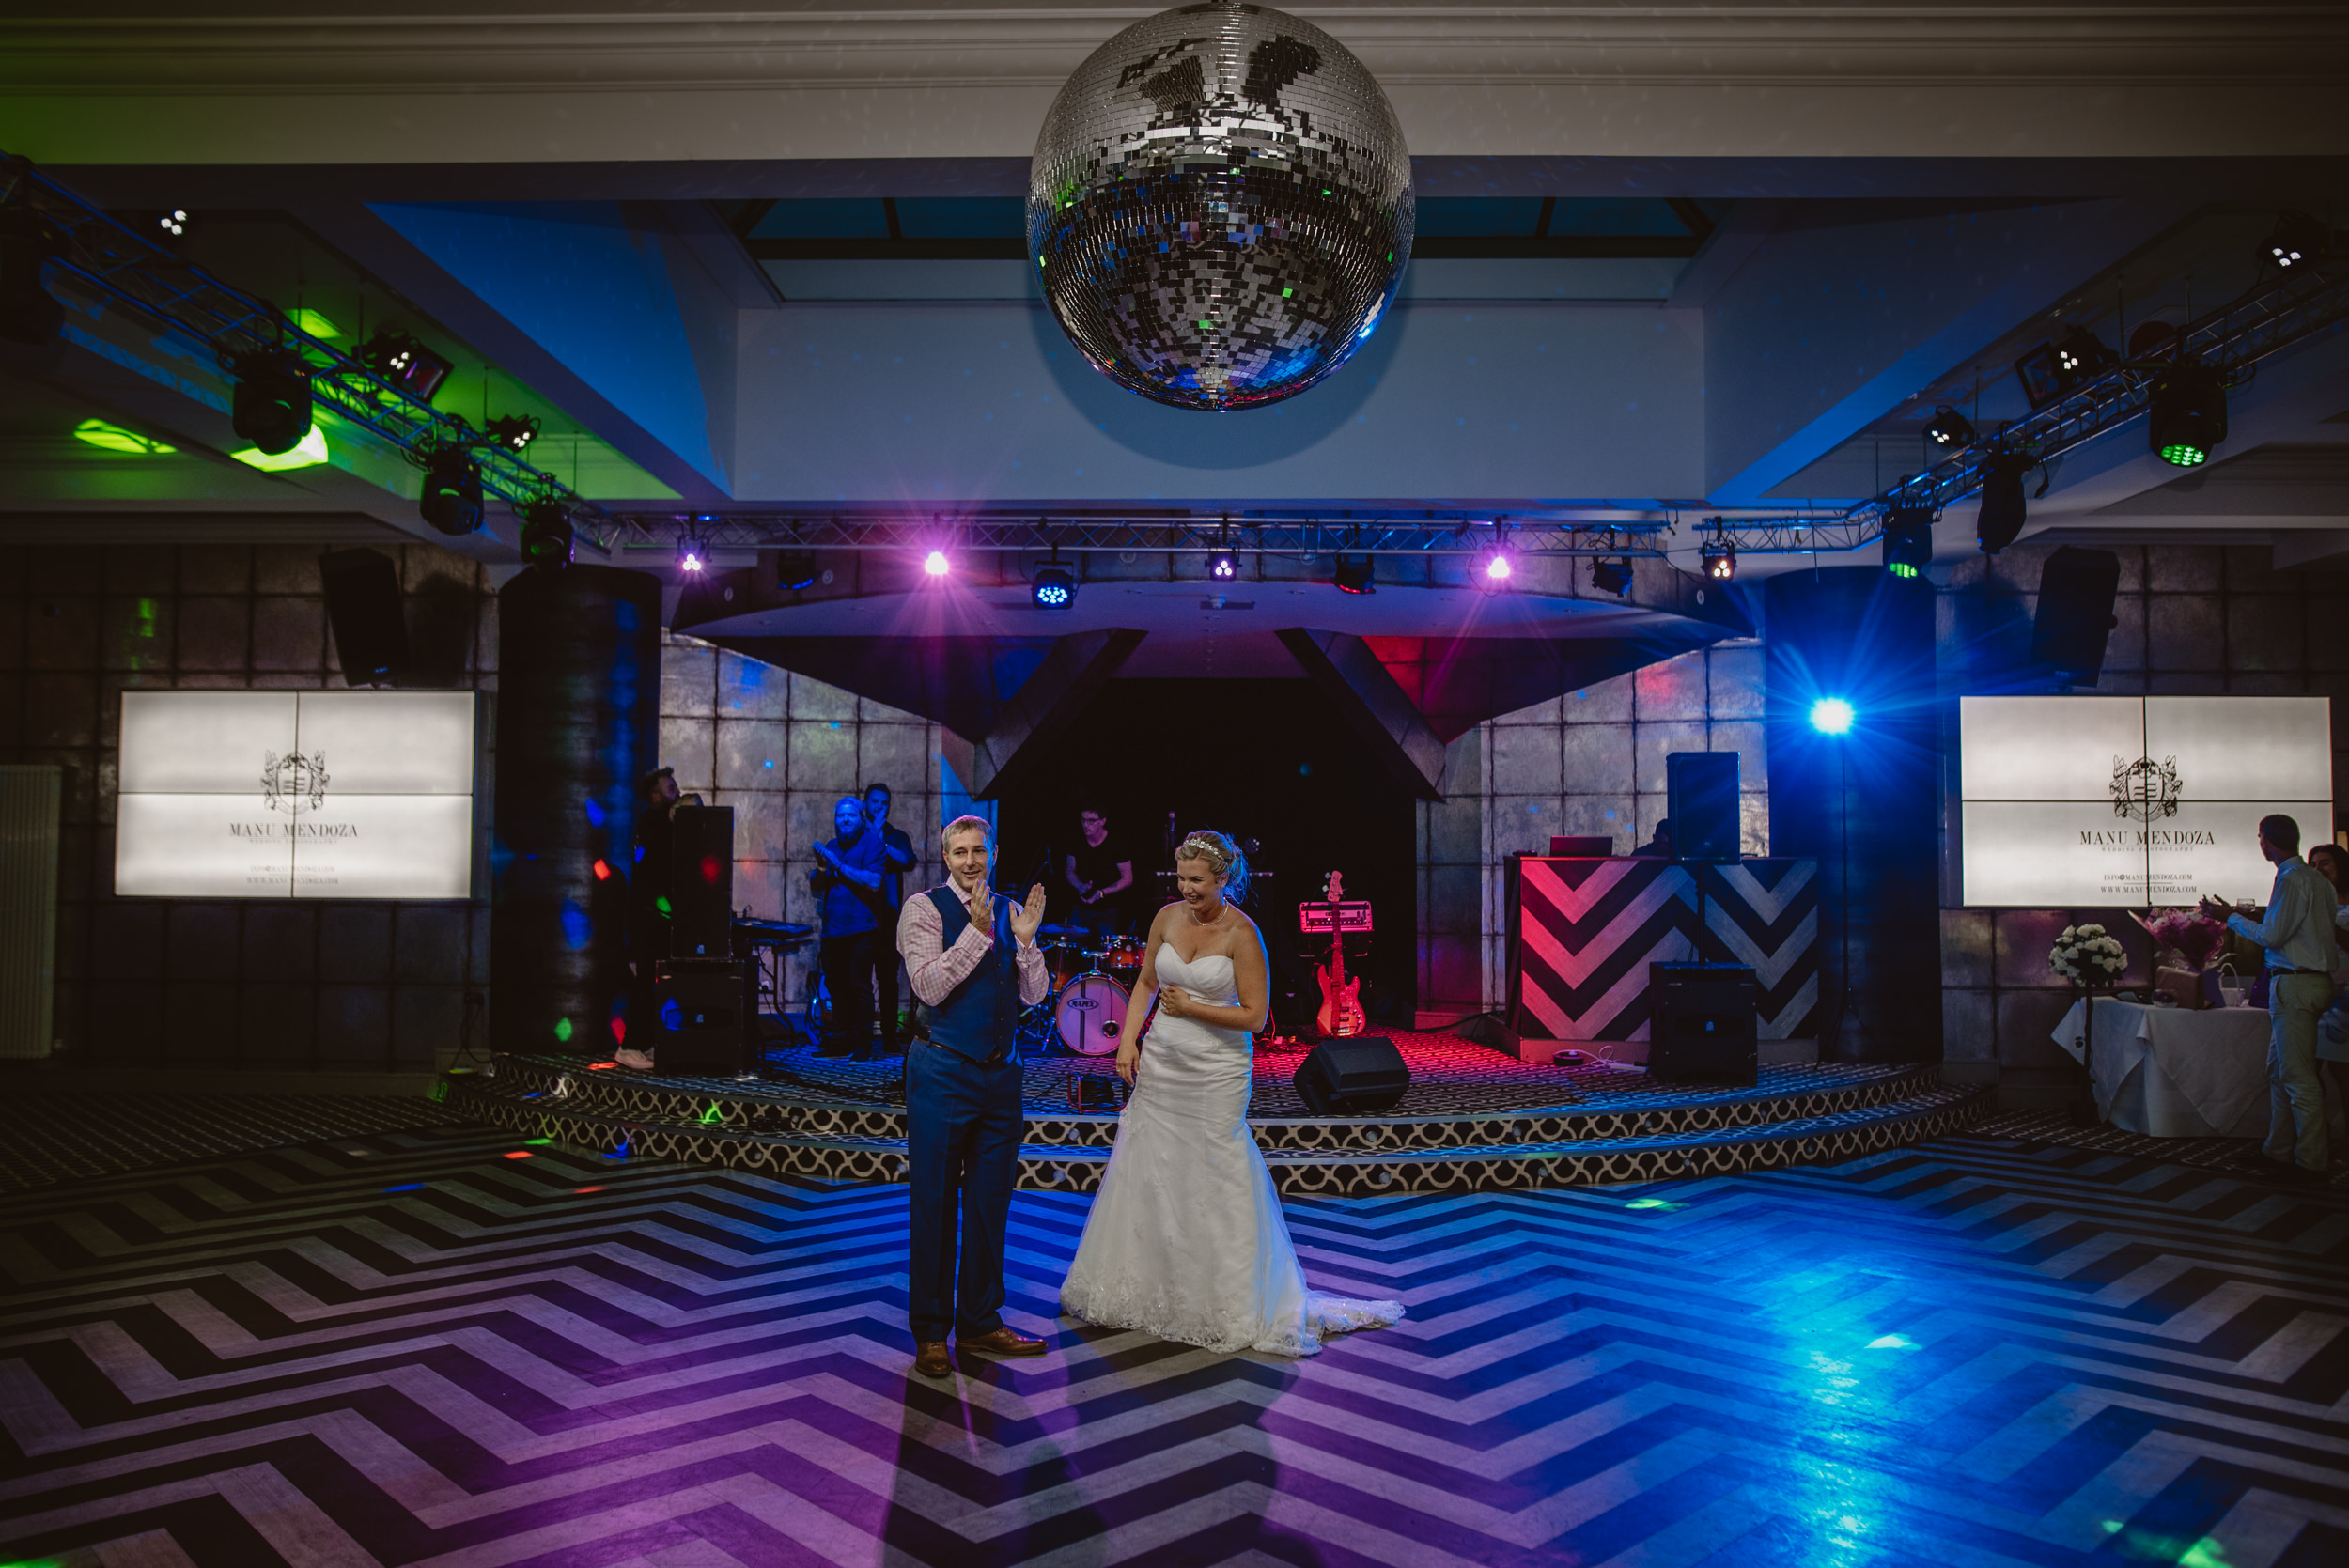 Chantelle-and-Stephen-Old-Thorns-Hotel-Wedding-Liphook-Manu-Mendoza-Wedding-Photography-553.jpg